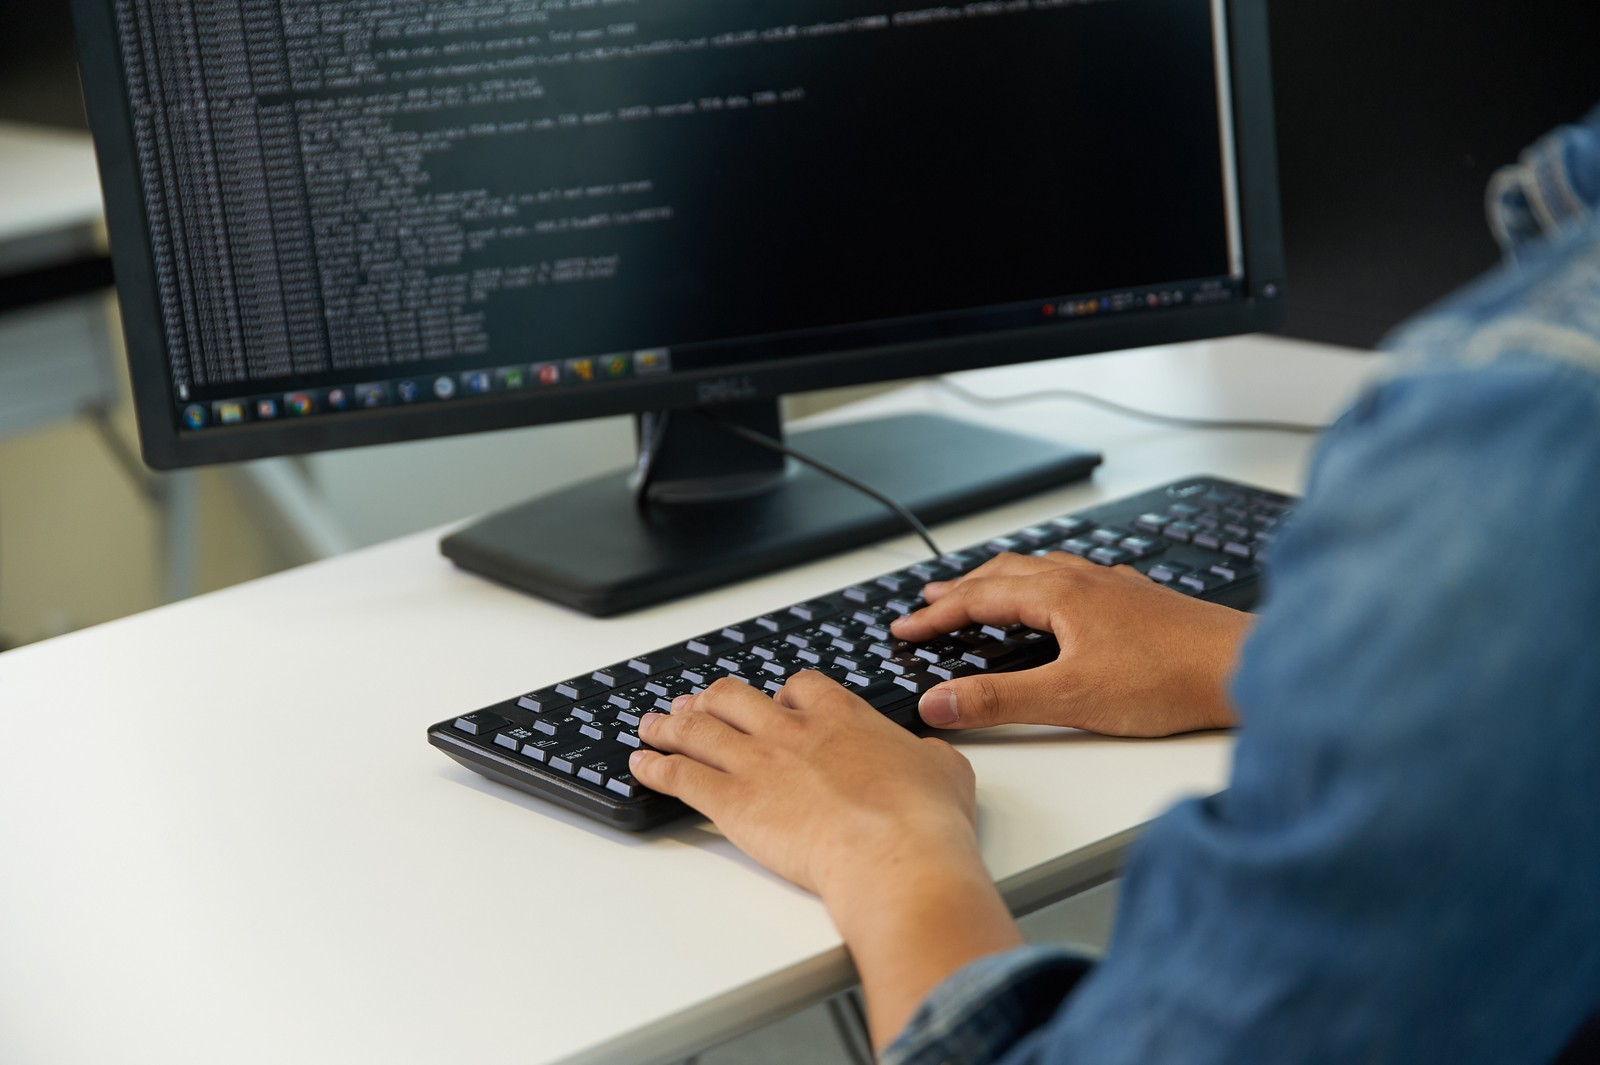 【IoT(組込み)エンジニア】3ヶ月の研修で最先端技術のプロフェッショナルへ!<プロジェクト多数/資格取得支援制度有>